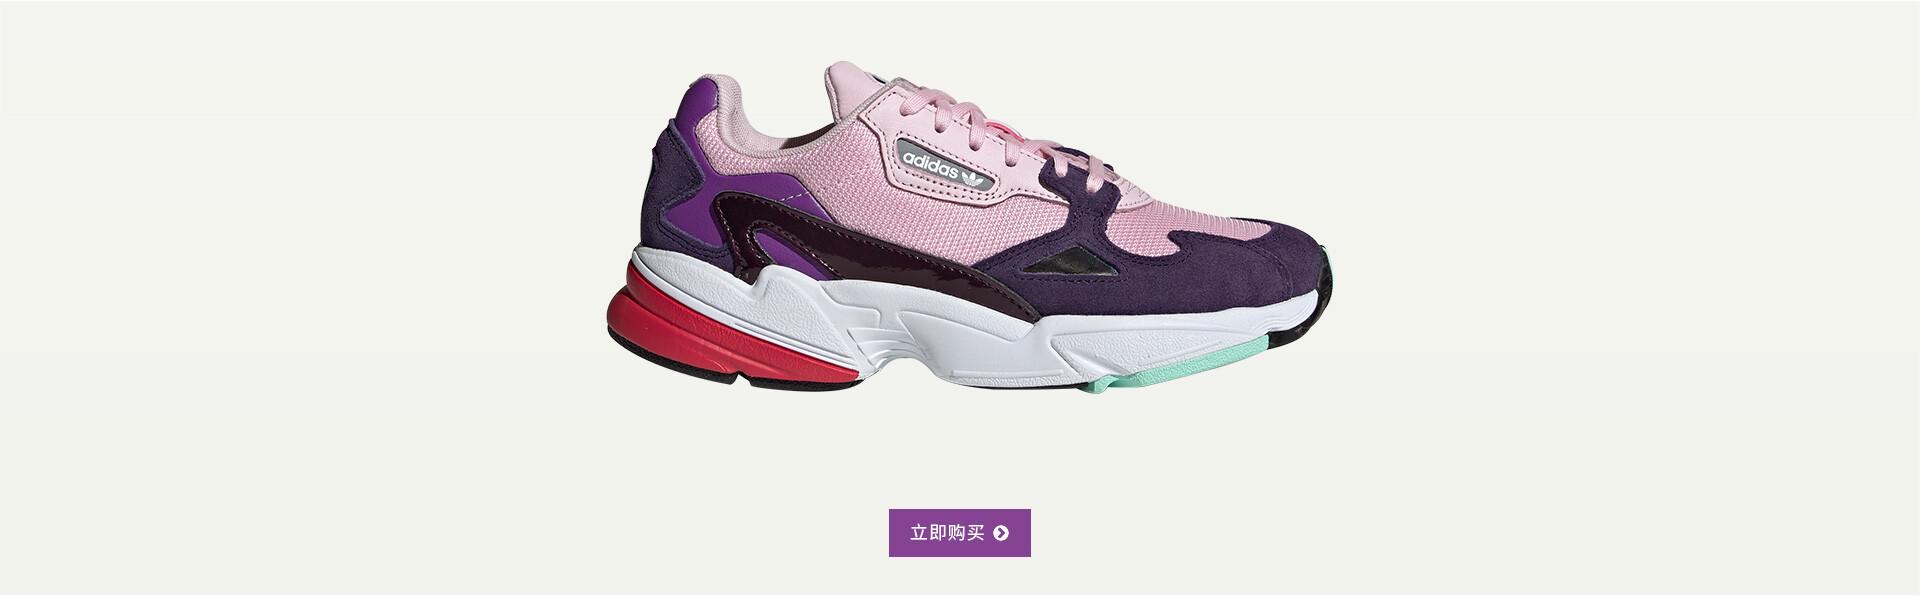 latest pre order cheap for sale 阿迪达斯官方adidas 三叶草FALCON W 女子经典鞋BD7825 如图36 ...